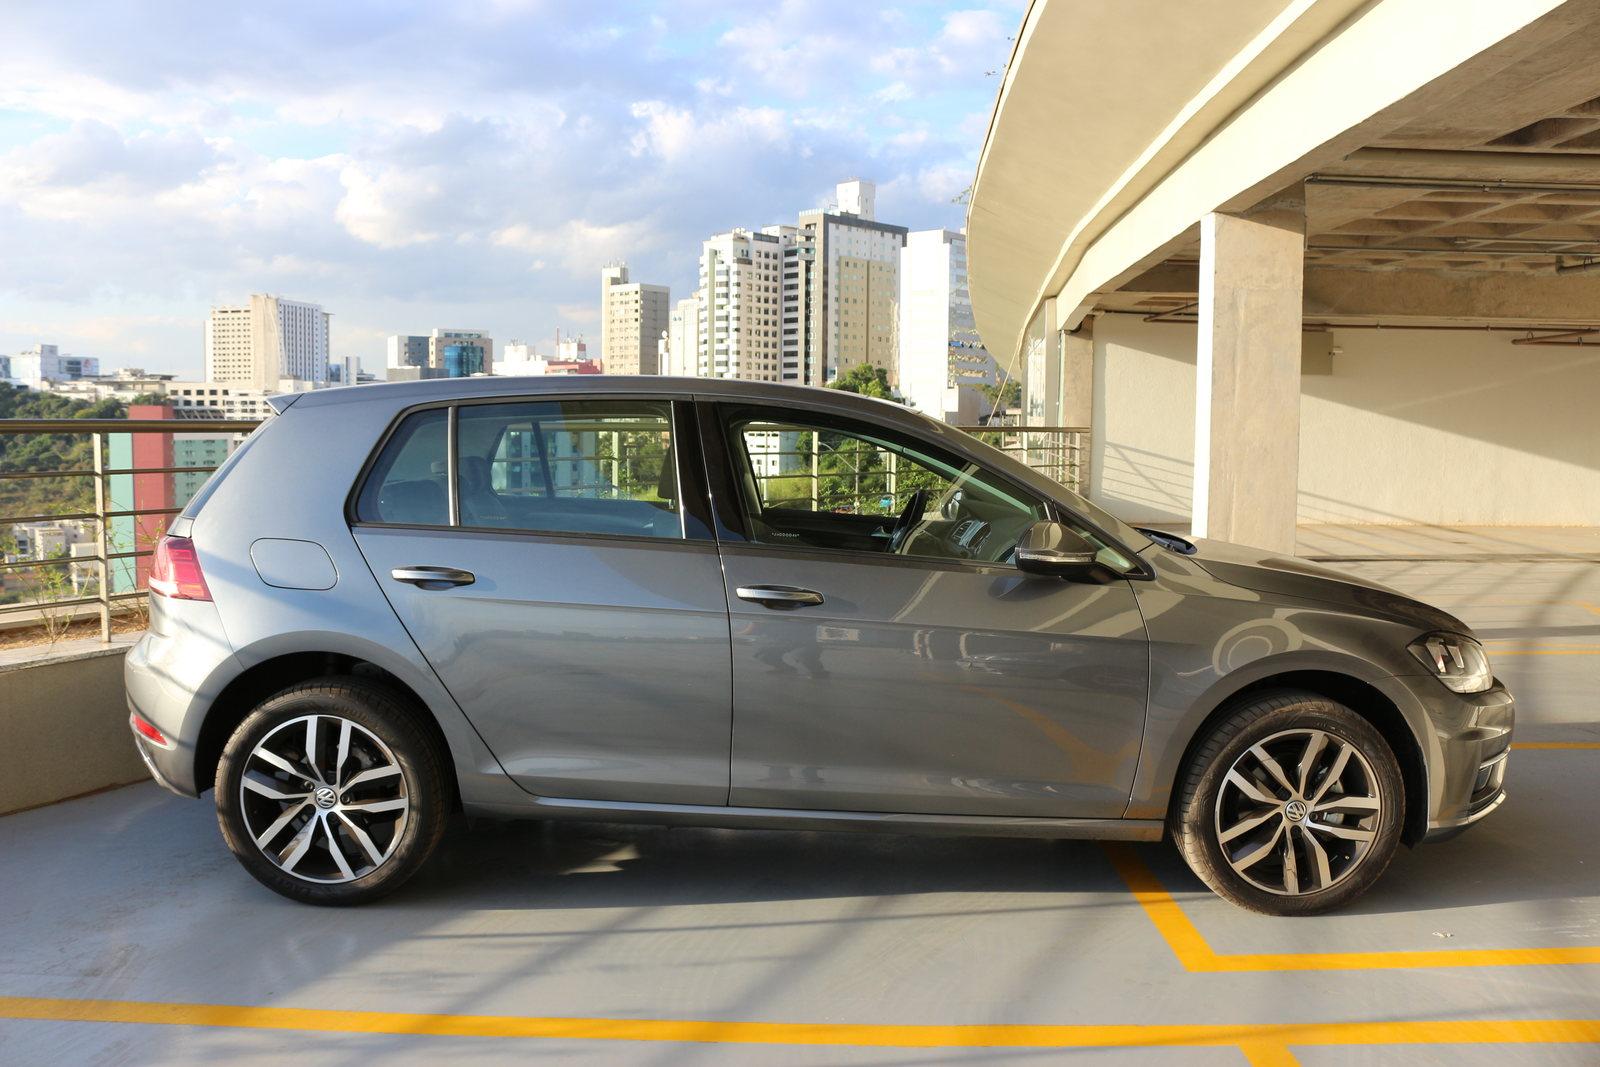 Avaliação Volkswagen Golf Comfortline